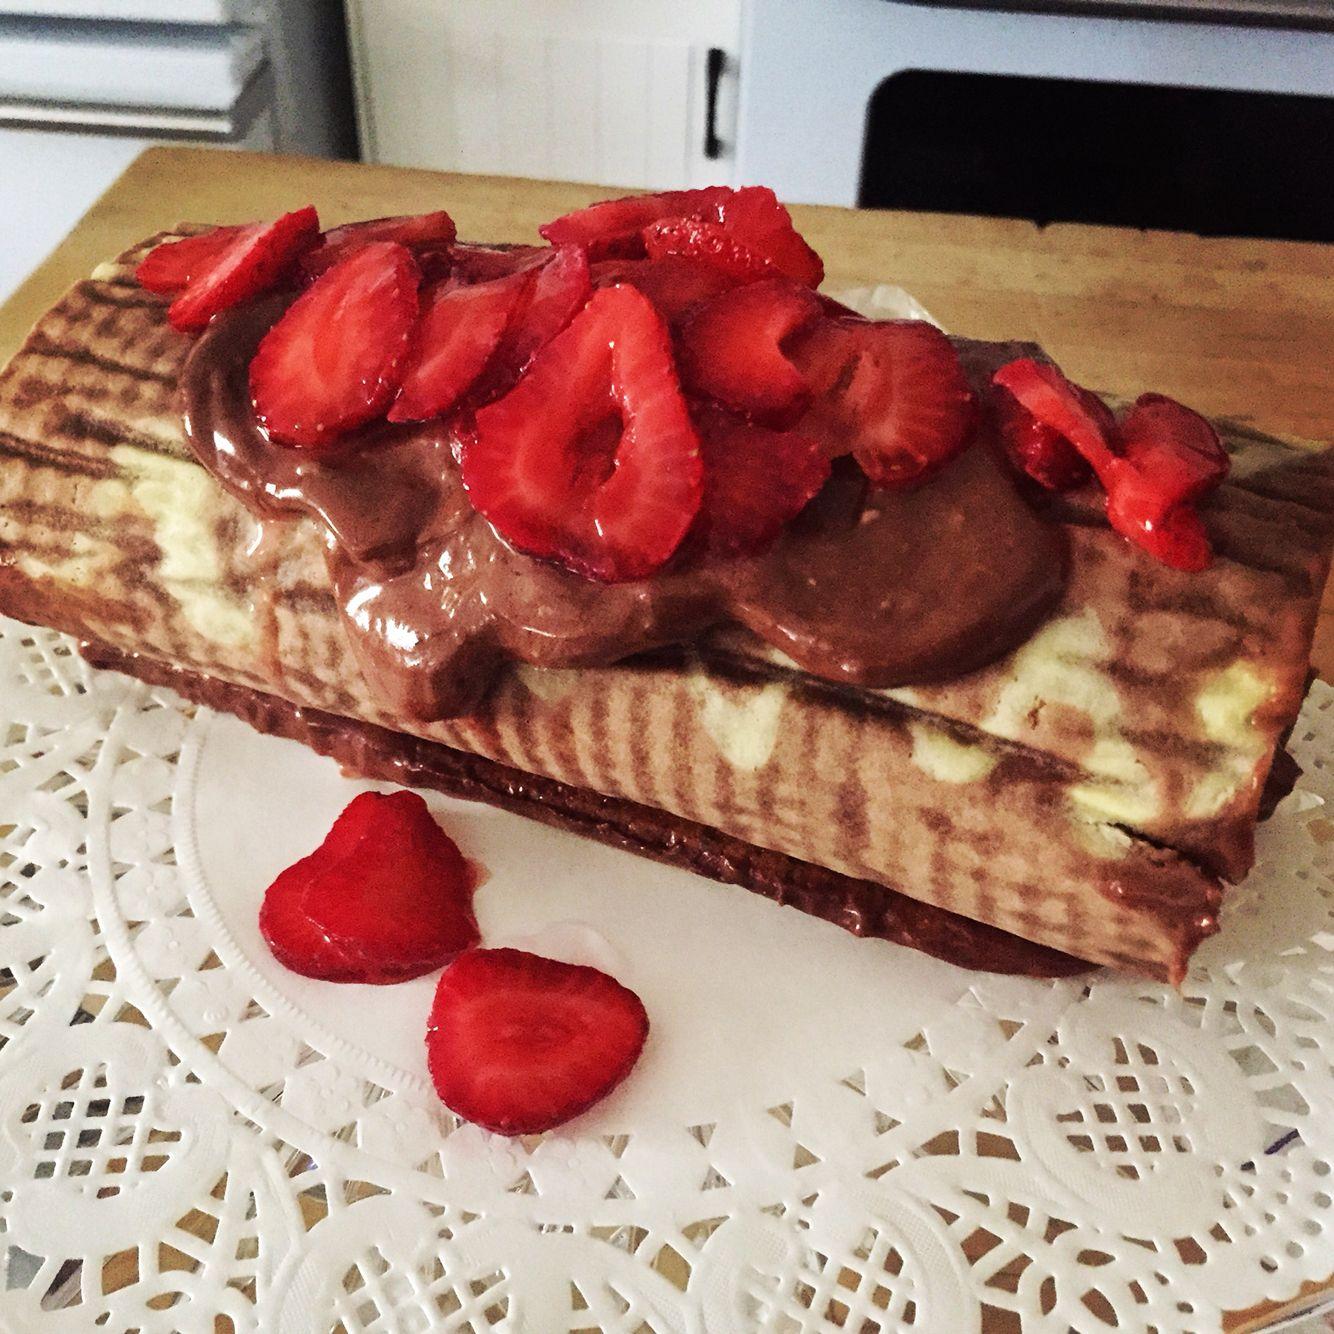 Chocolate strawberry roll cake.